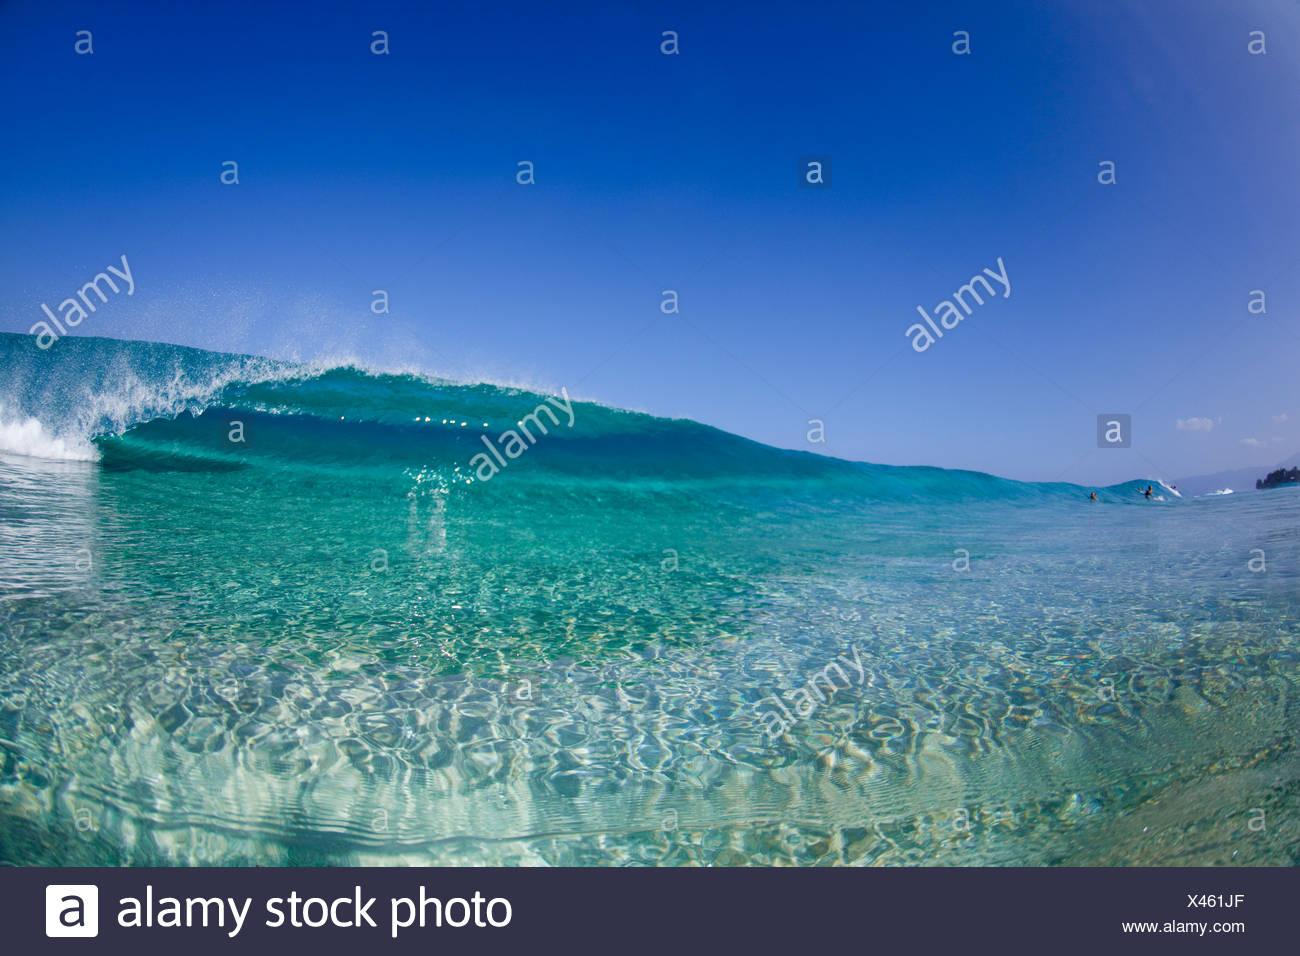 A water view of a tubing wave at Ehukai beach park. - Stock Image